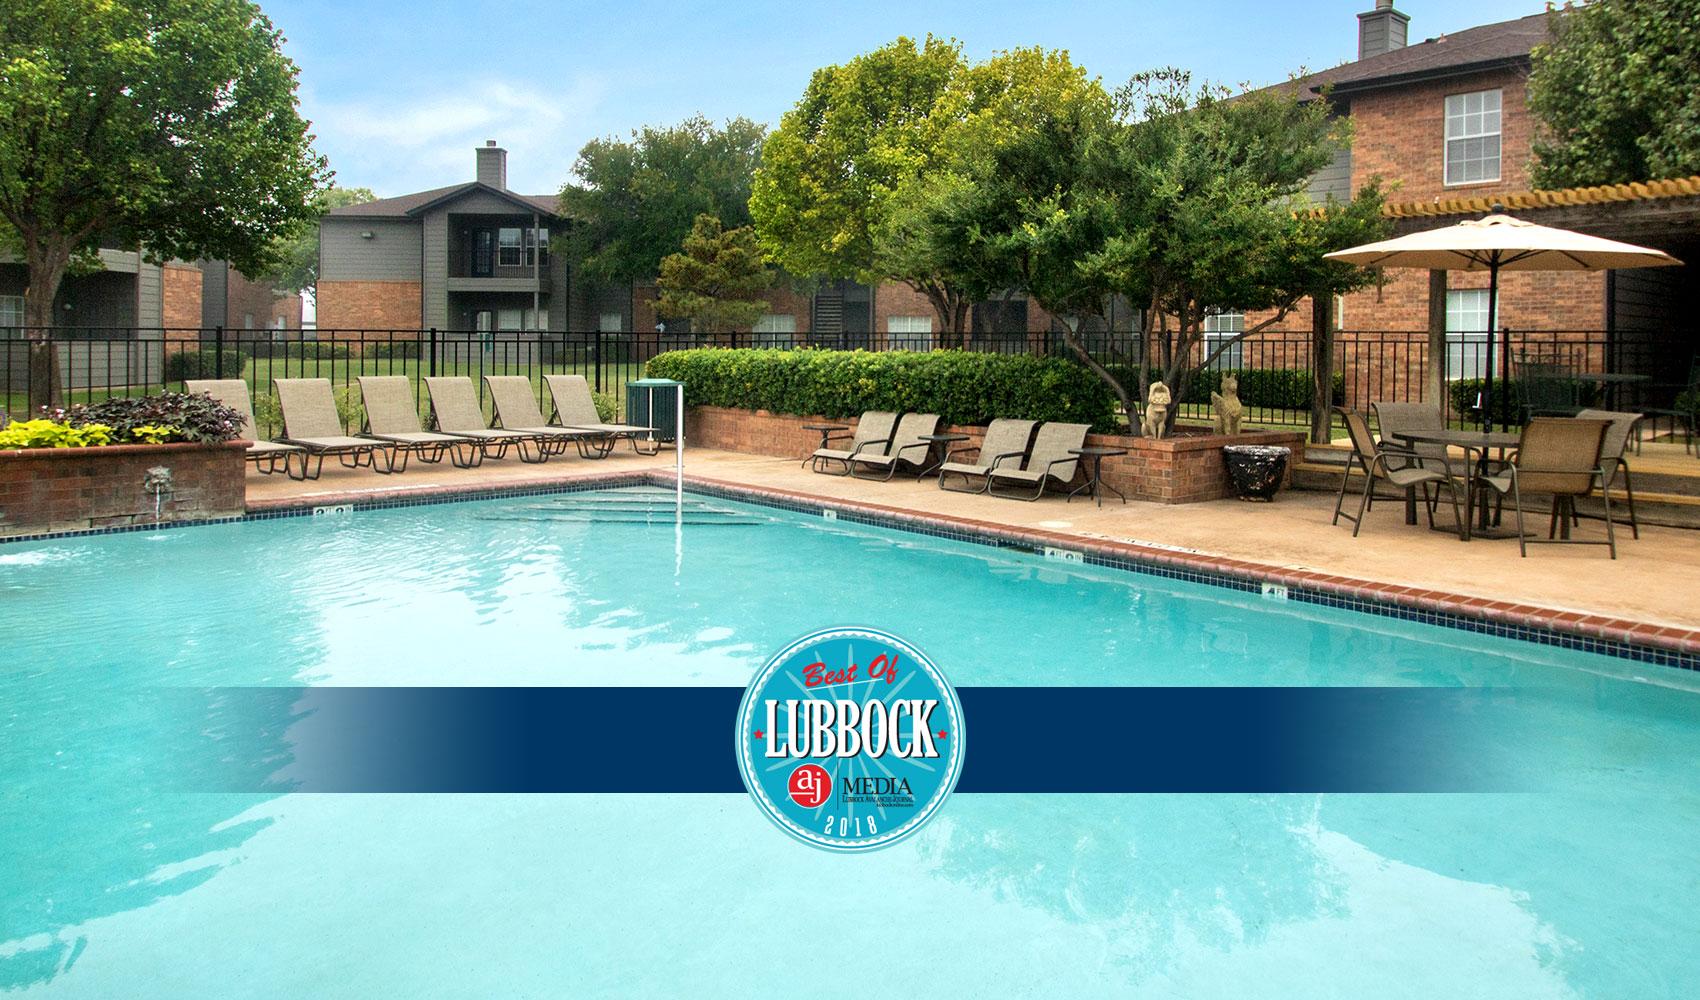 Quaker Heights Lubbock,Texas <br><img src=